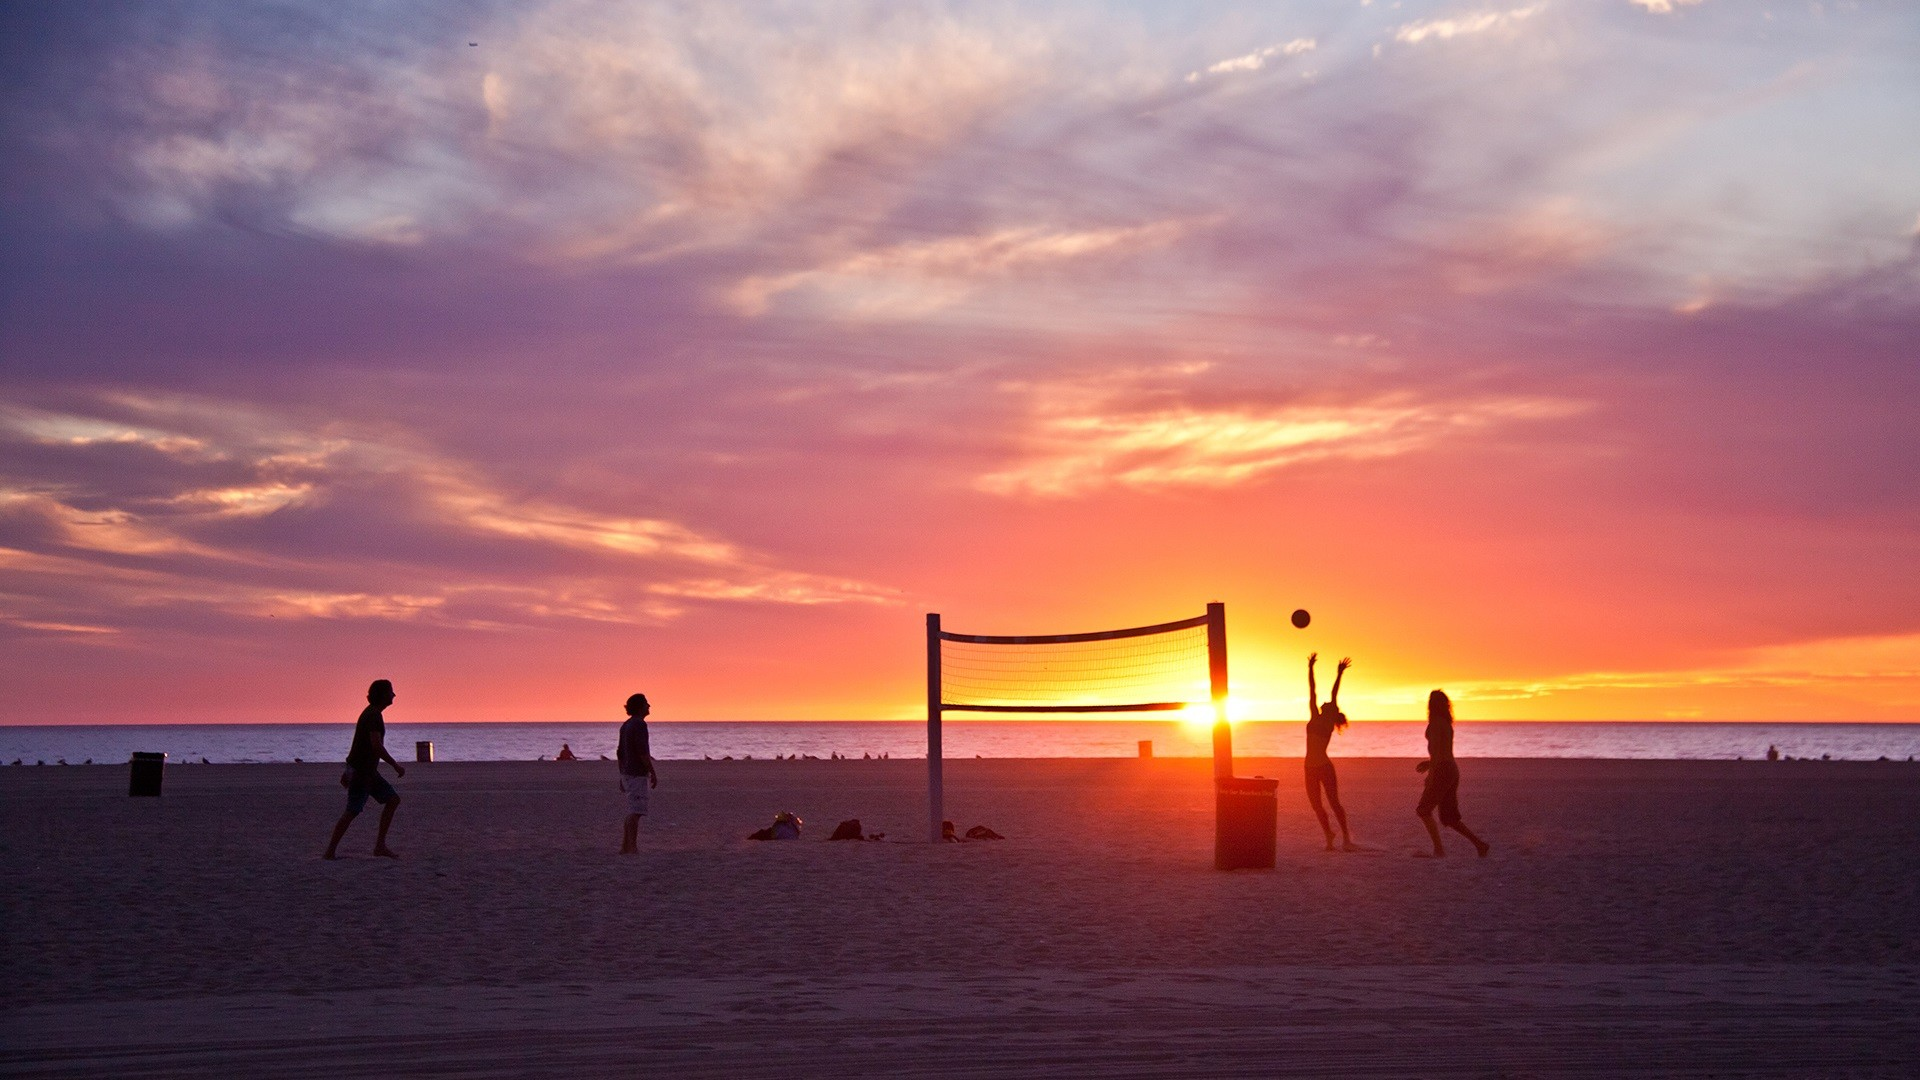 Venice Beach California Wallpaper (63+ images)